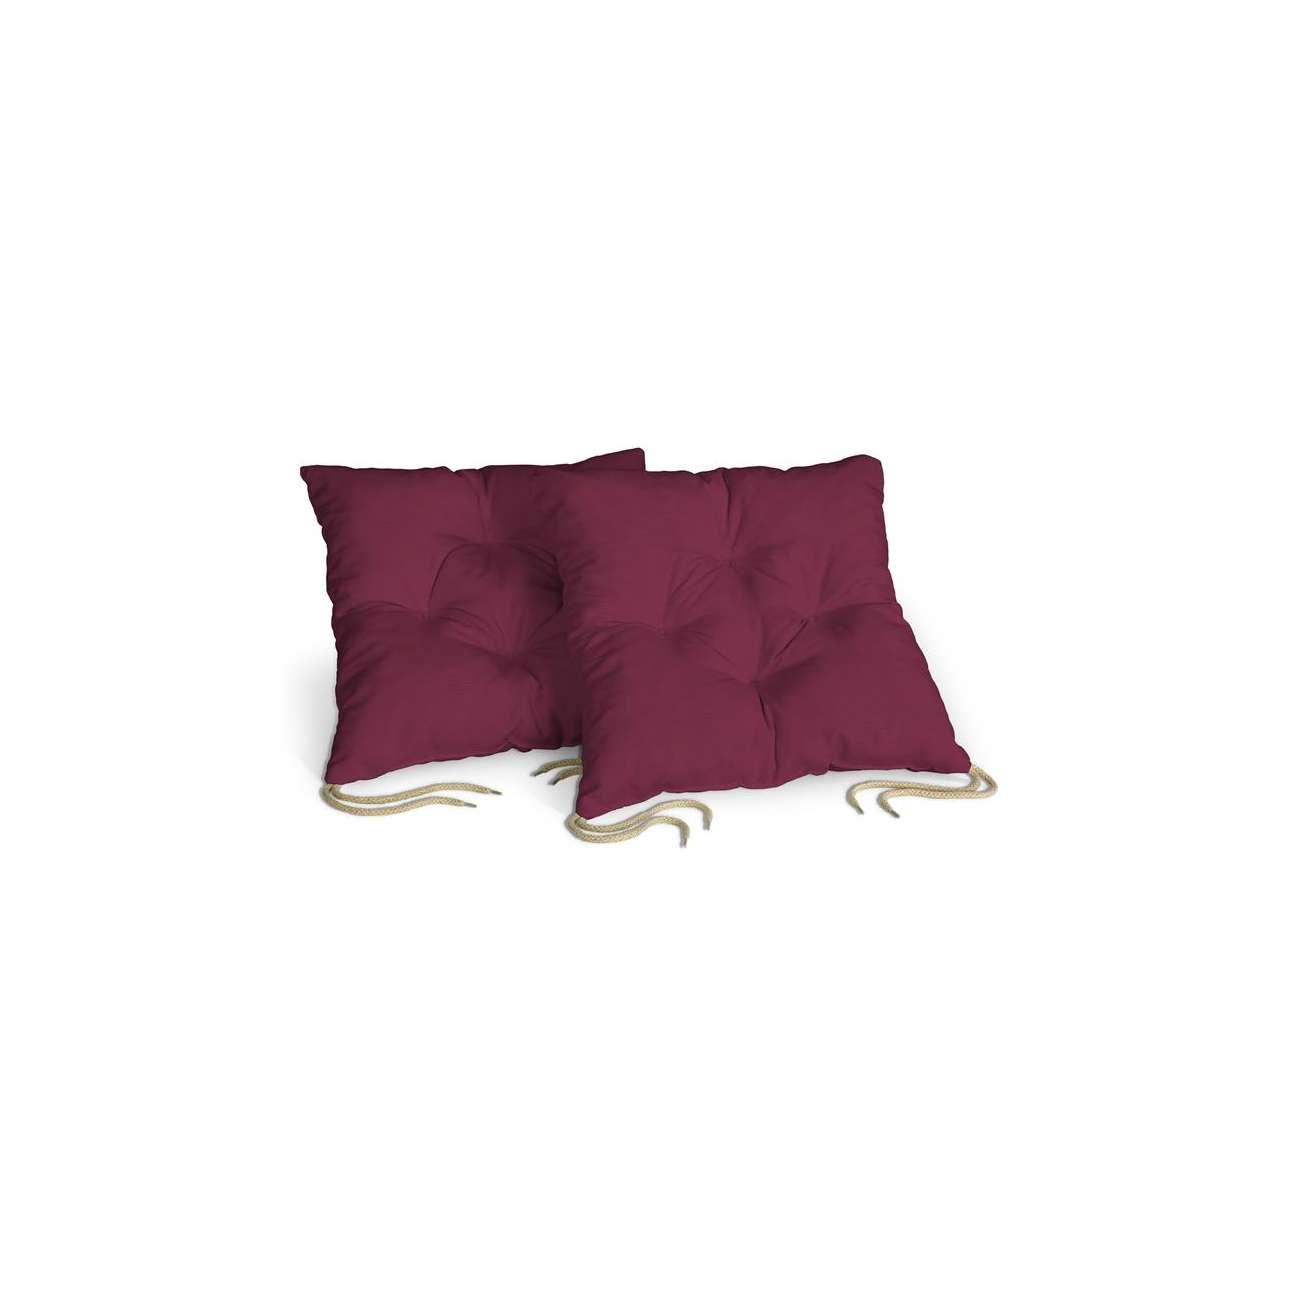 Sedáky 2-pack Cotton Panama 09 (702-05)